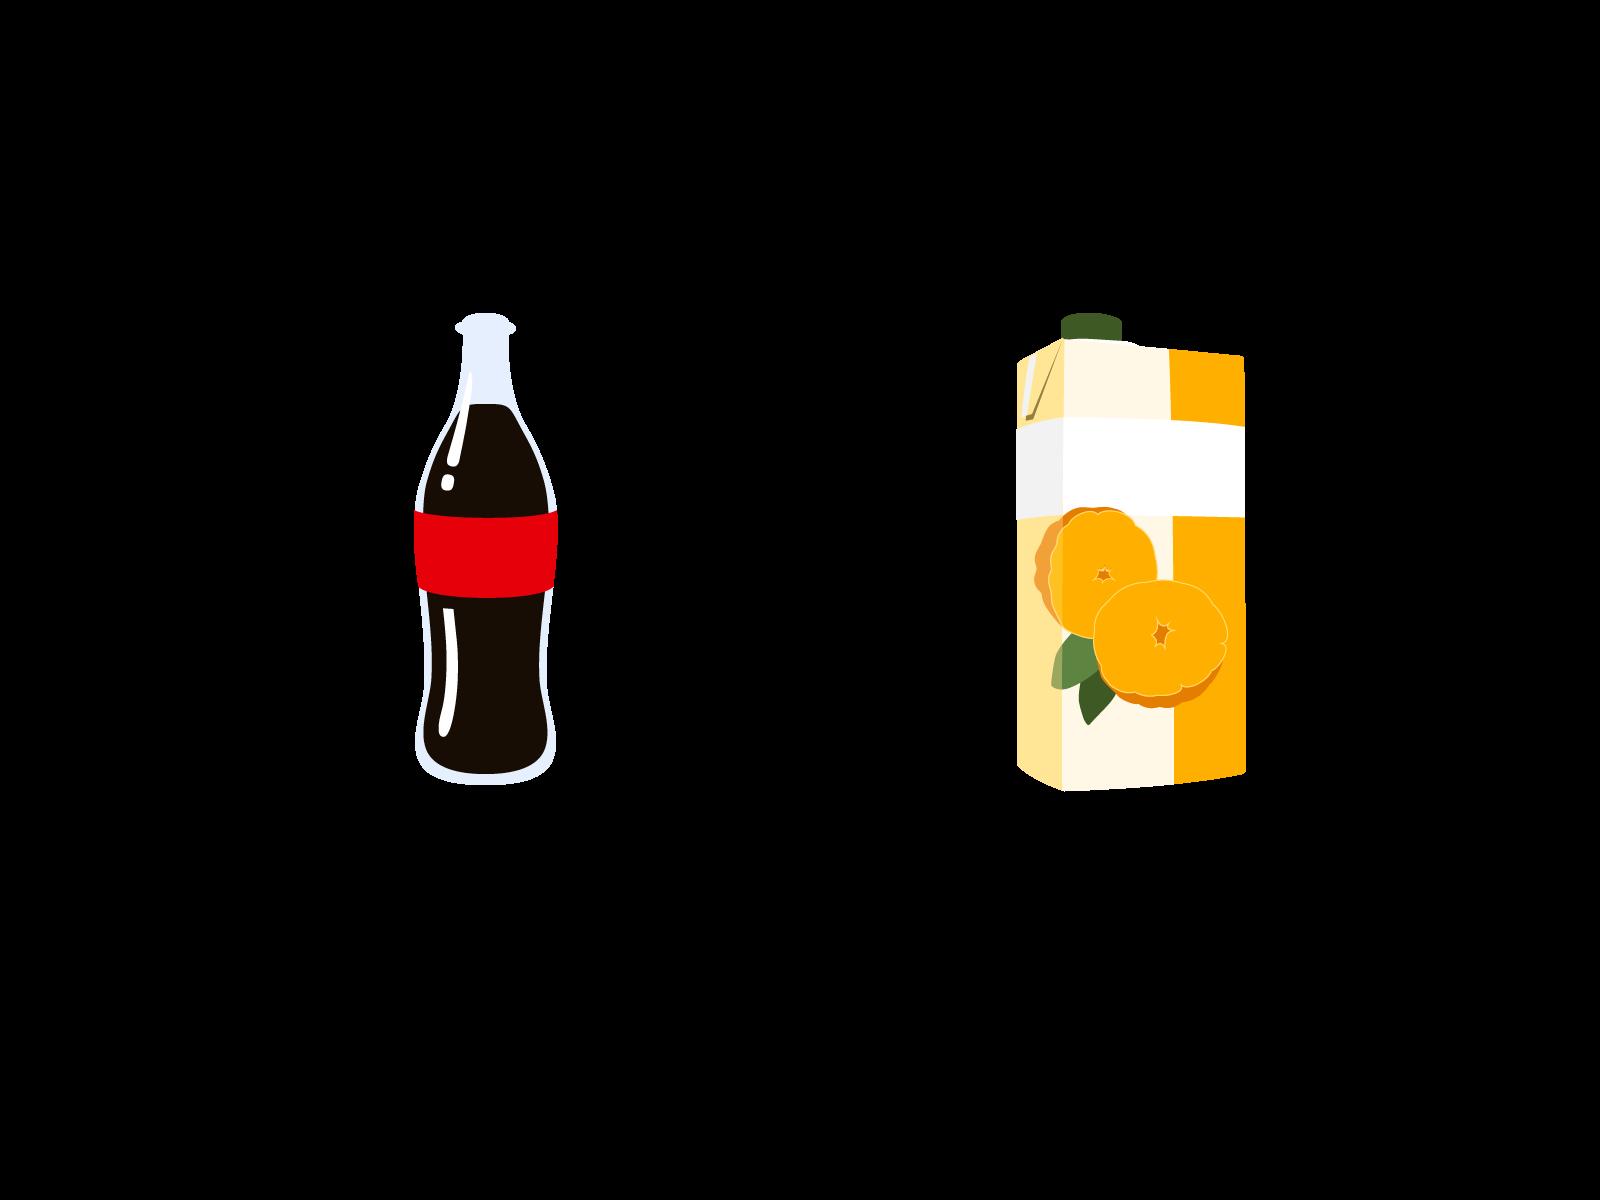 zucker empfohlene tagesmenge